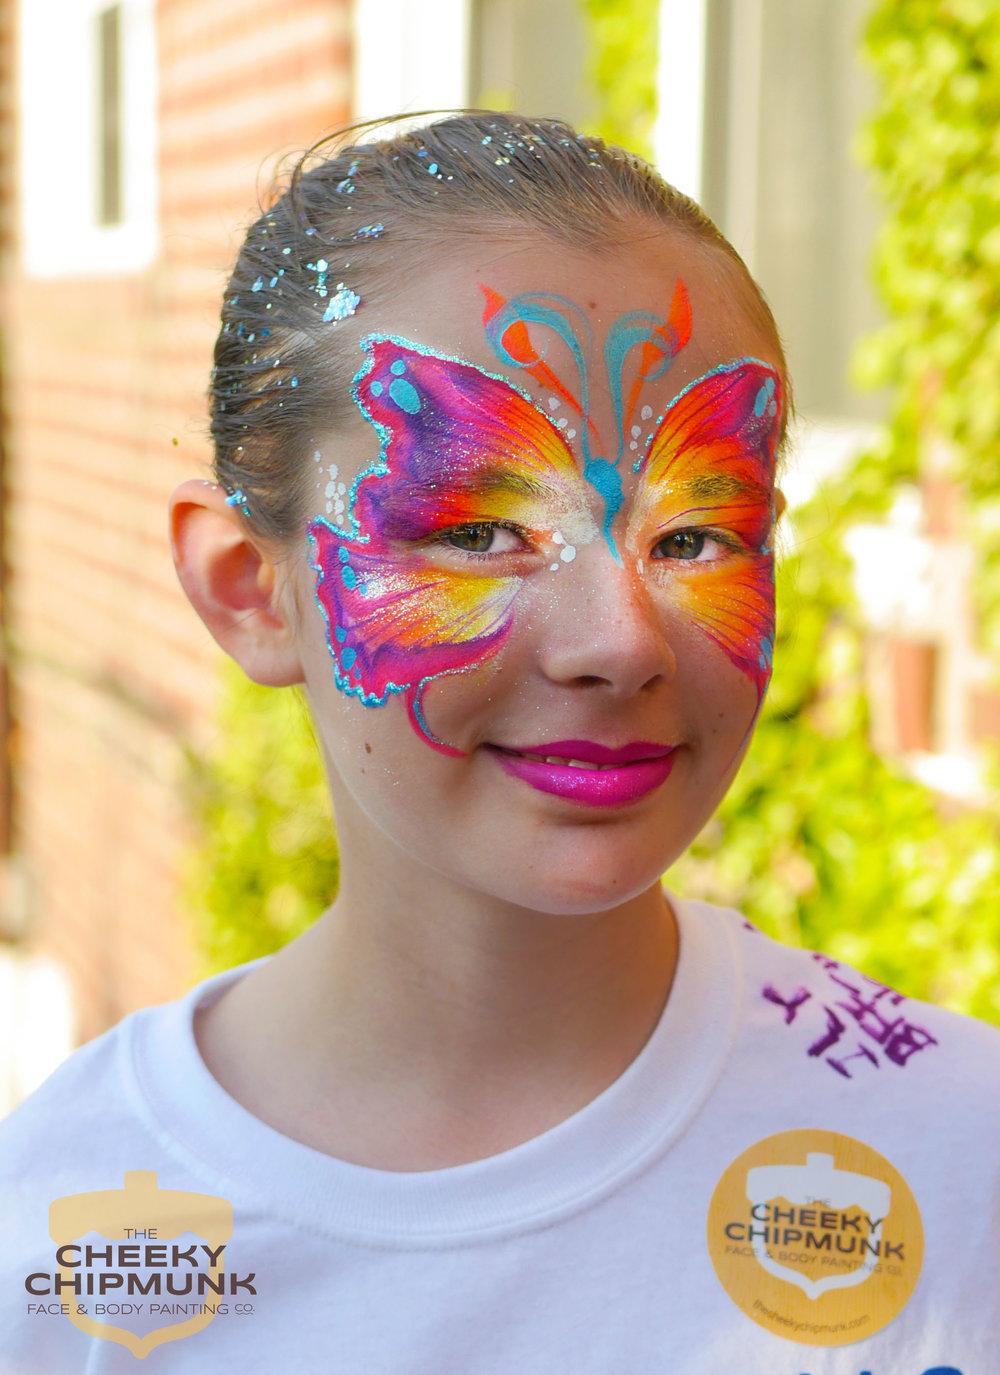 Butterfly2_FacePainting_NYCfacepainter_lenorekoppelman_thecheekychipmunk_juicyfruit_sillyfarm_frankie_birthday_party.jpg